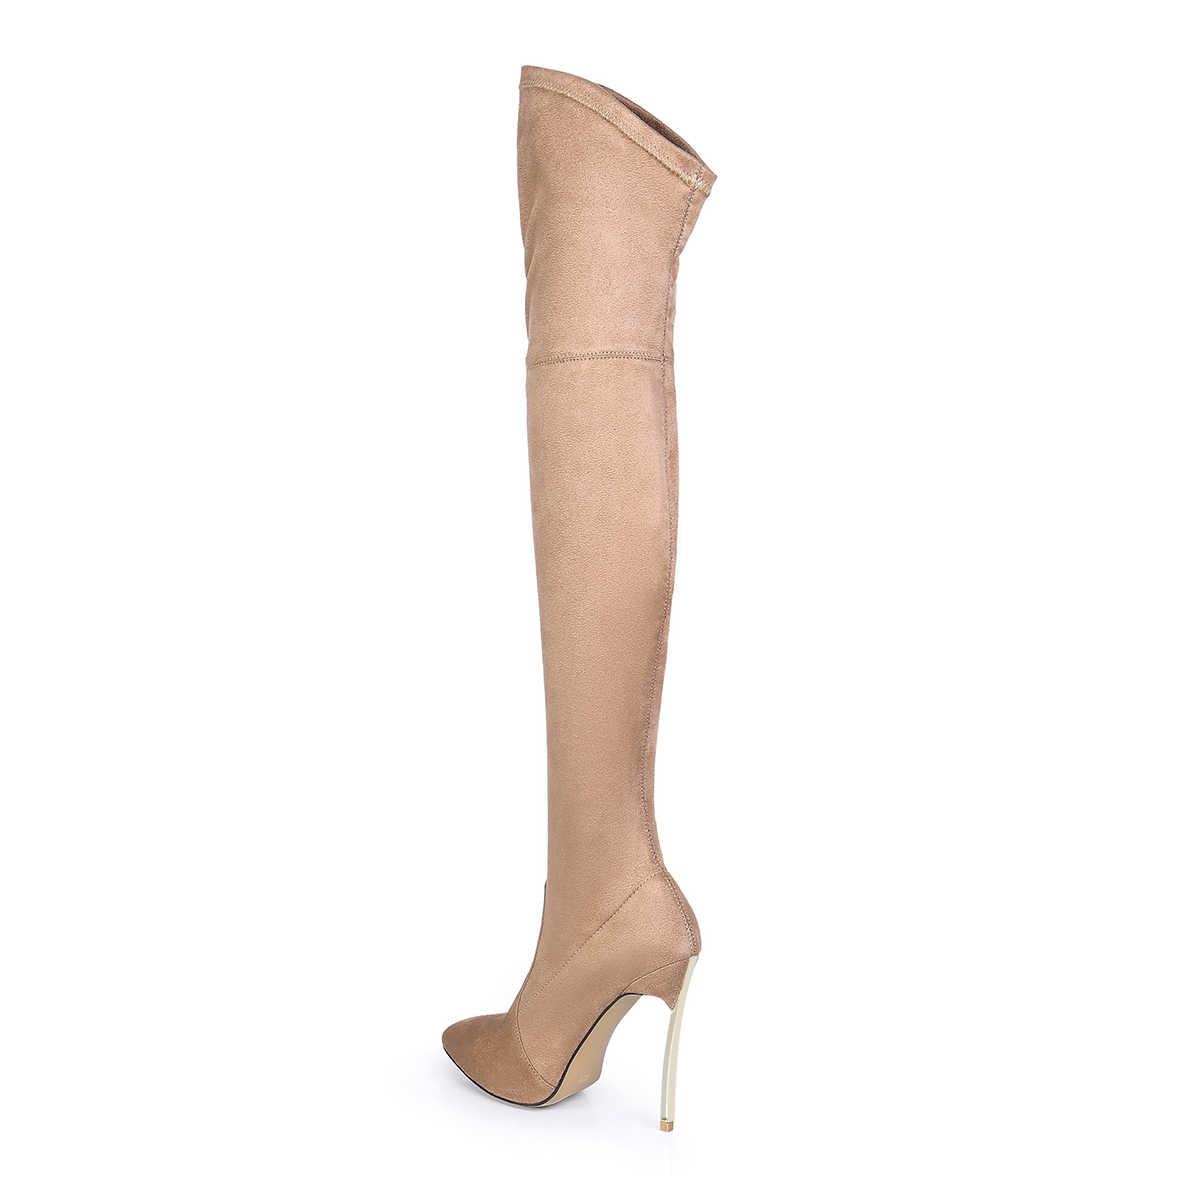 Rumbidzo ผู้หญิงฤดูใบไม้ร่วงฤดูหนาว Slim ต้นขาสูงรองเท้ายืด Faux Suede กว่าเข่าบู๊ทส์รองเท้าส้นสูงขนาด 43